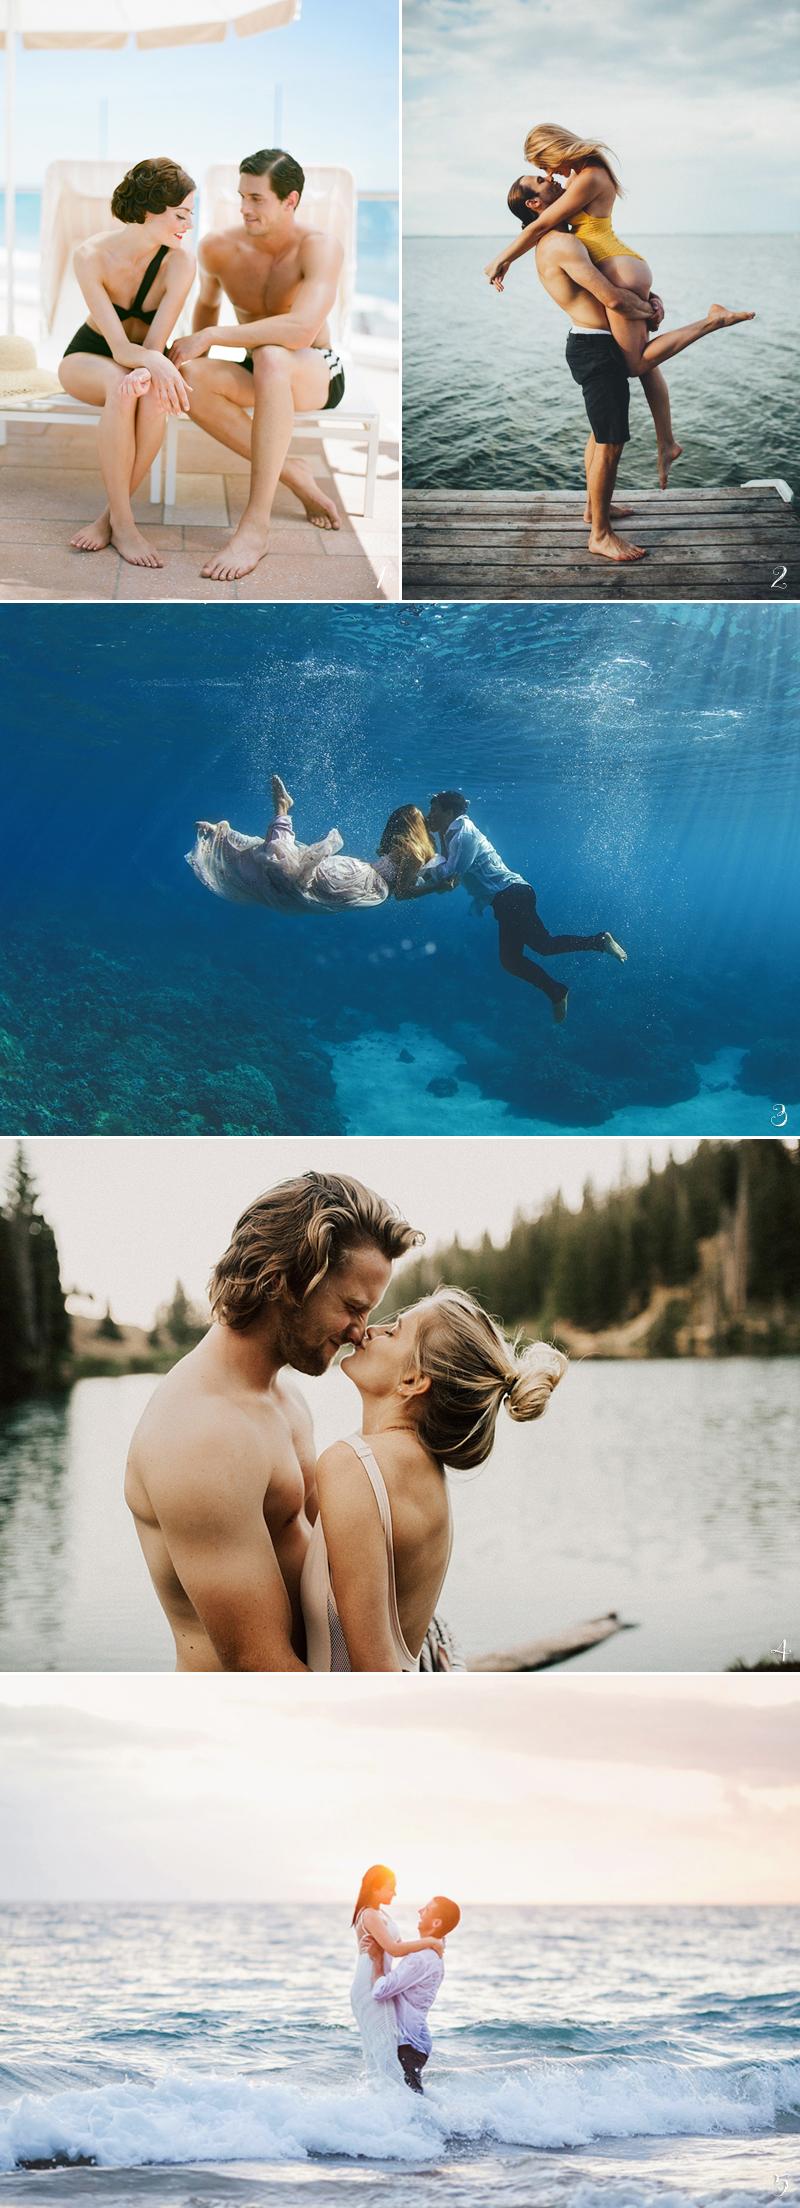 sports-engagement05-swim-diving